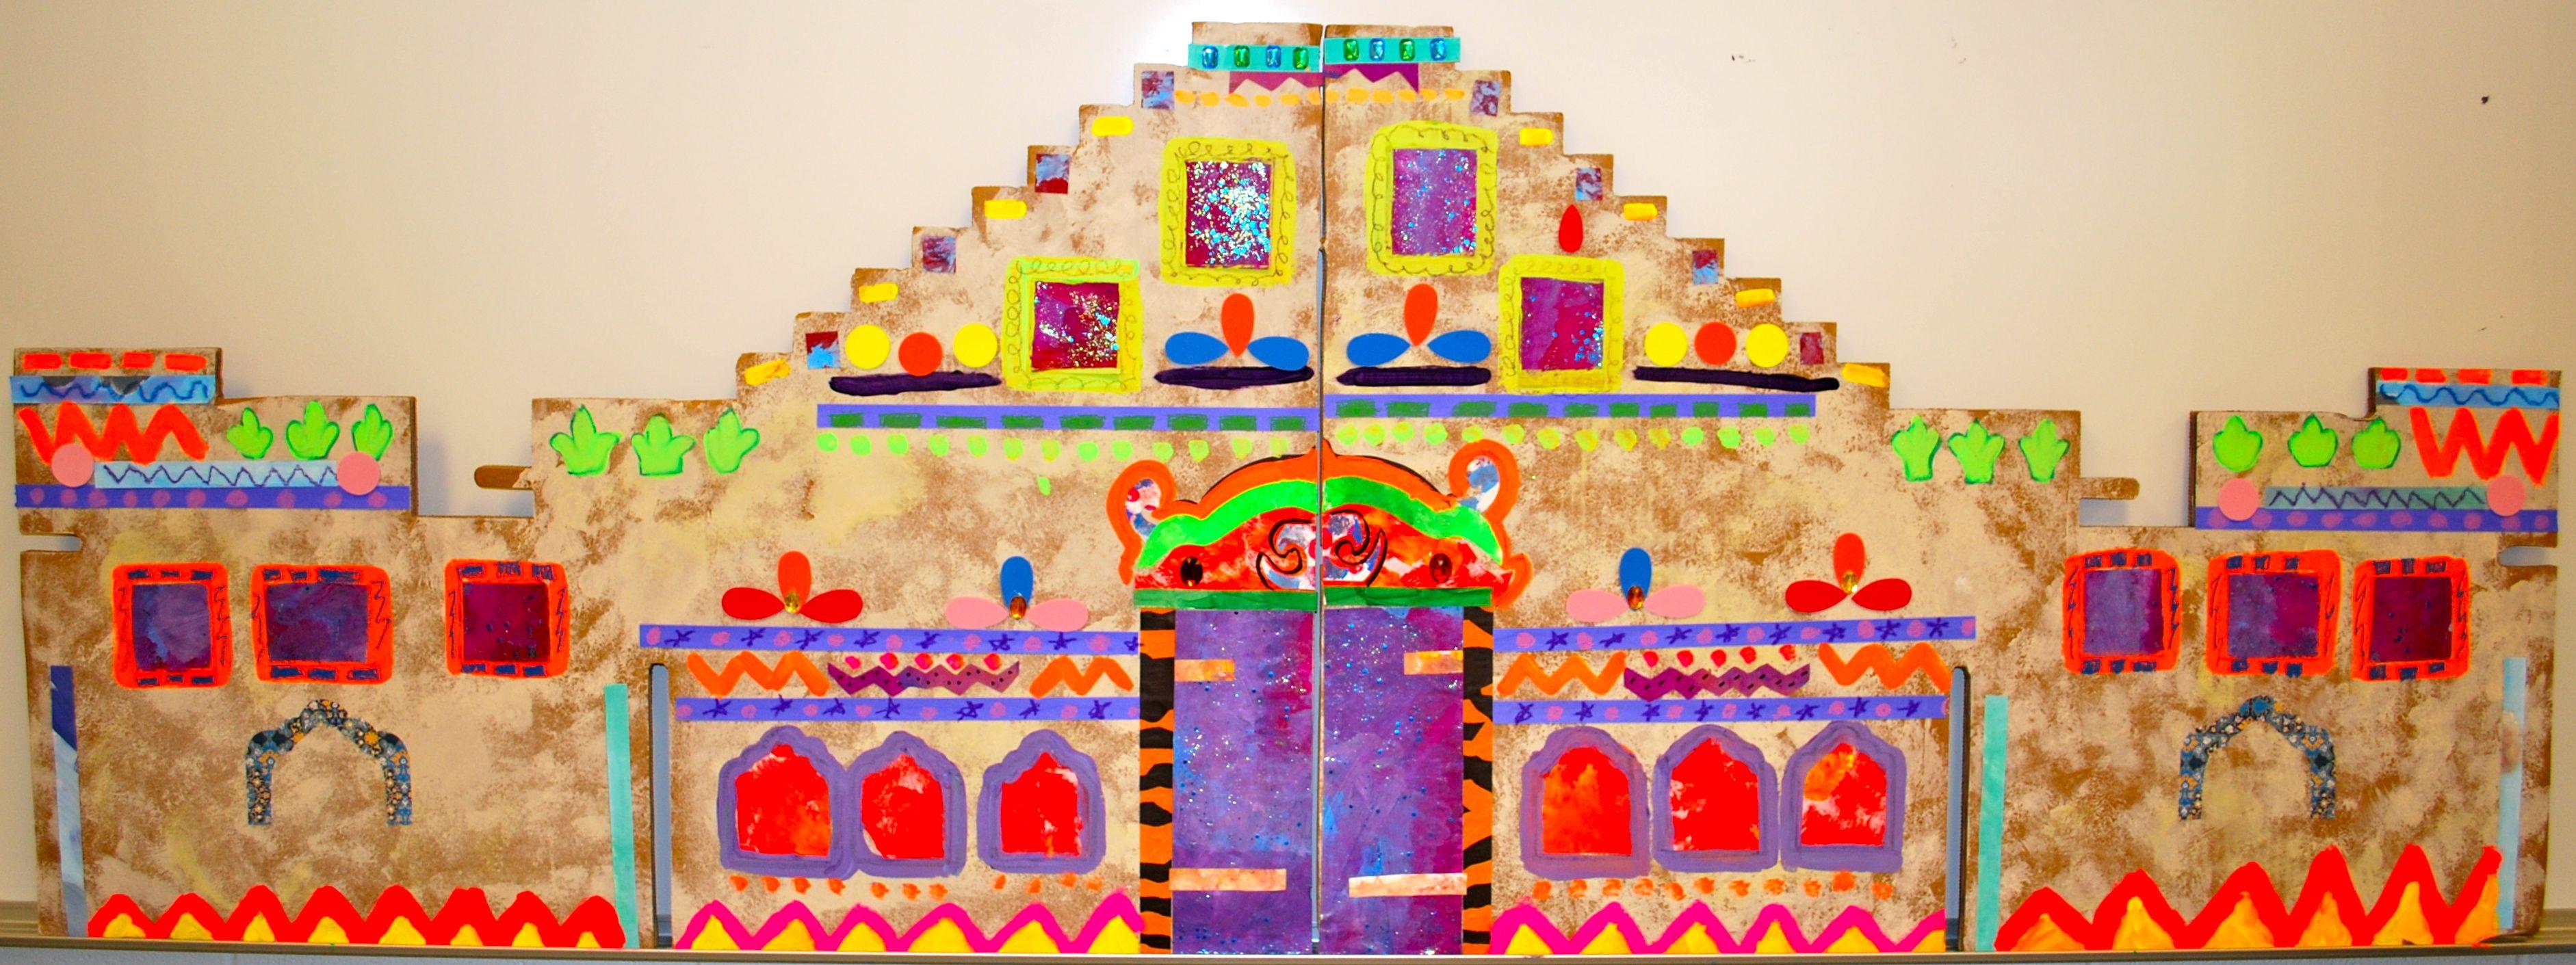 treasure-decorating-the-building-part-3_5136348301_o